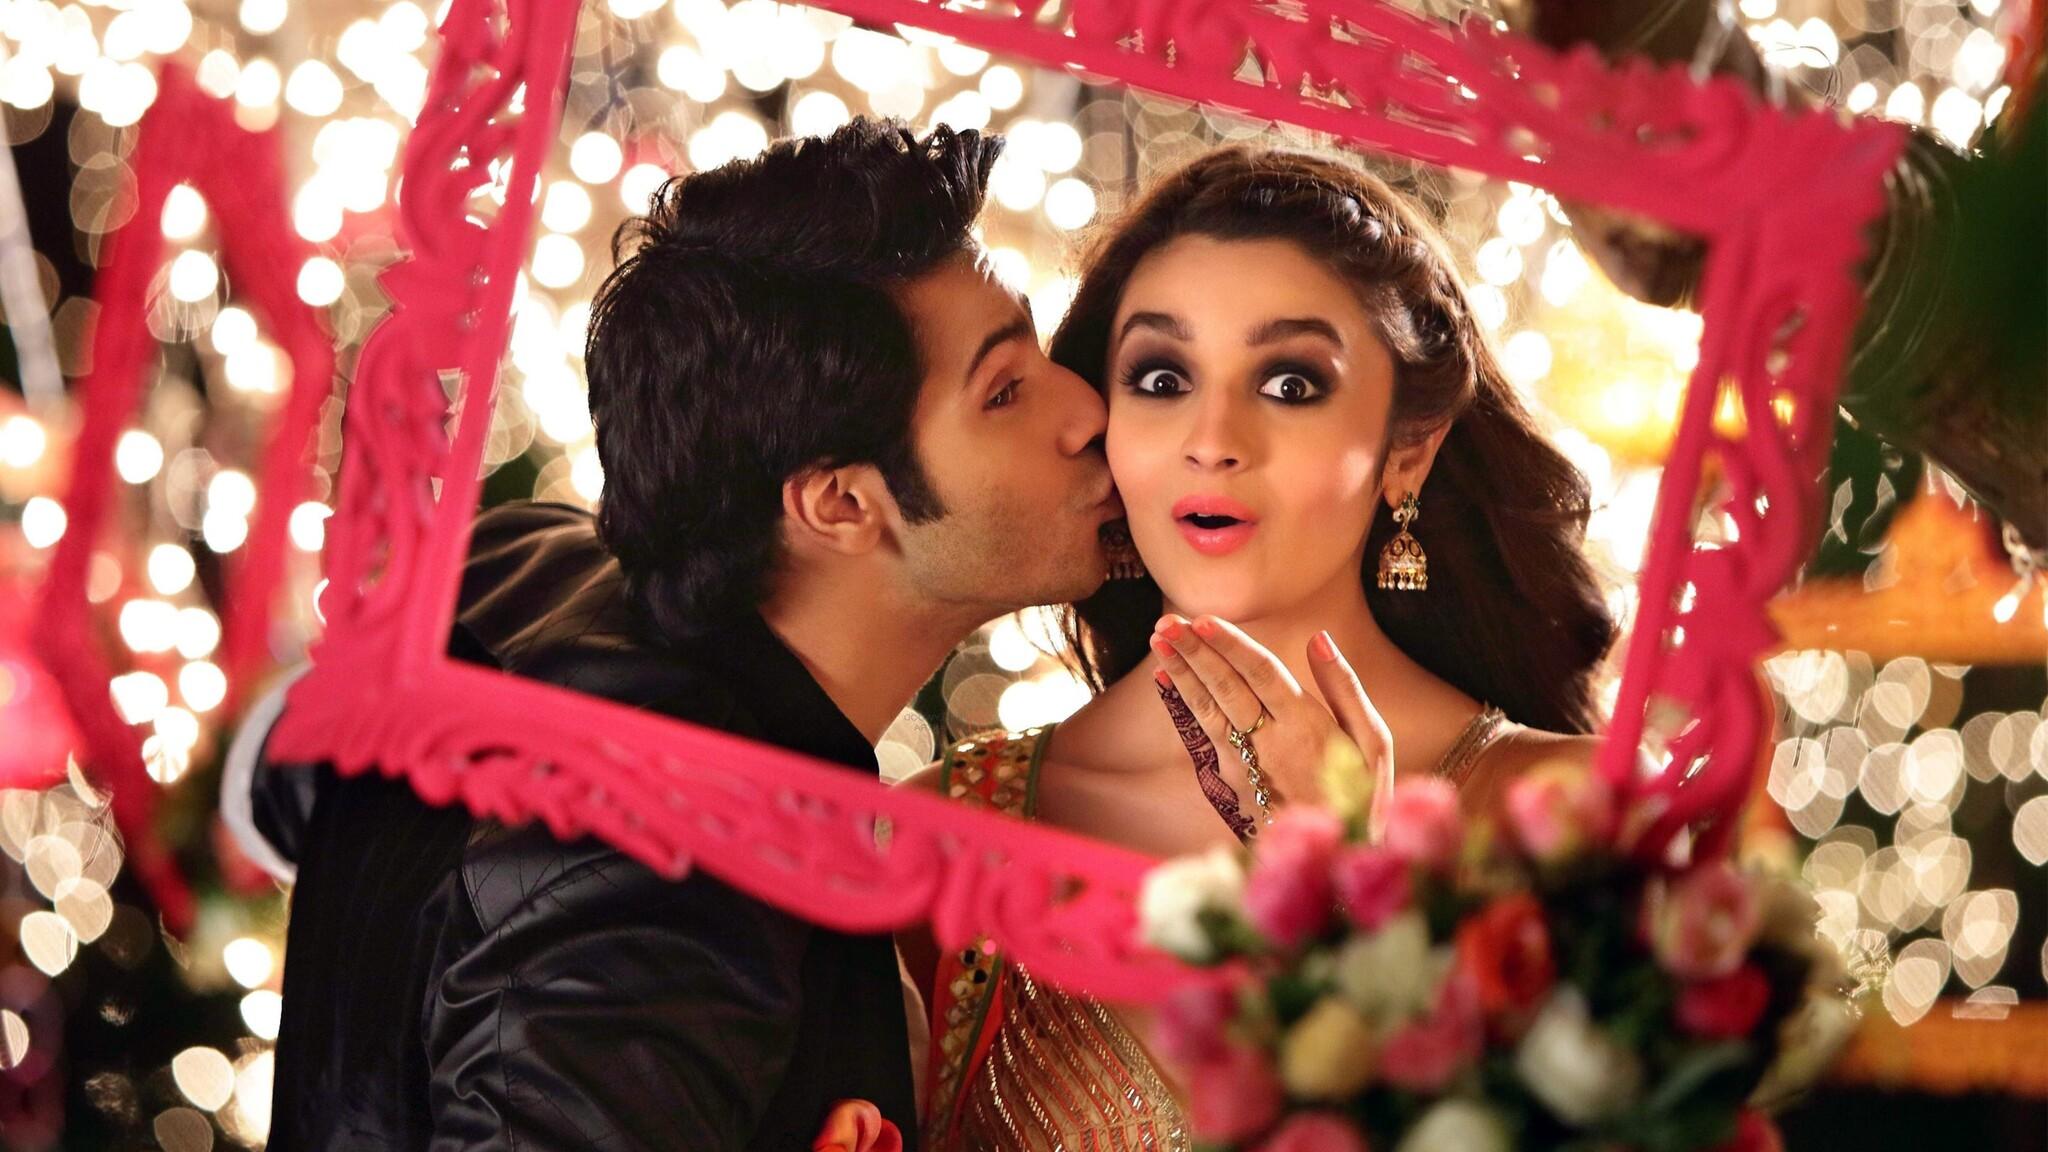 Varun Dhawan Alia Bhattwallpaper 2019hd: 2048x1152 Alia Bhatt Kissing Varun Dhawan 2048x1152